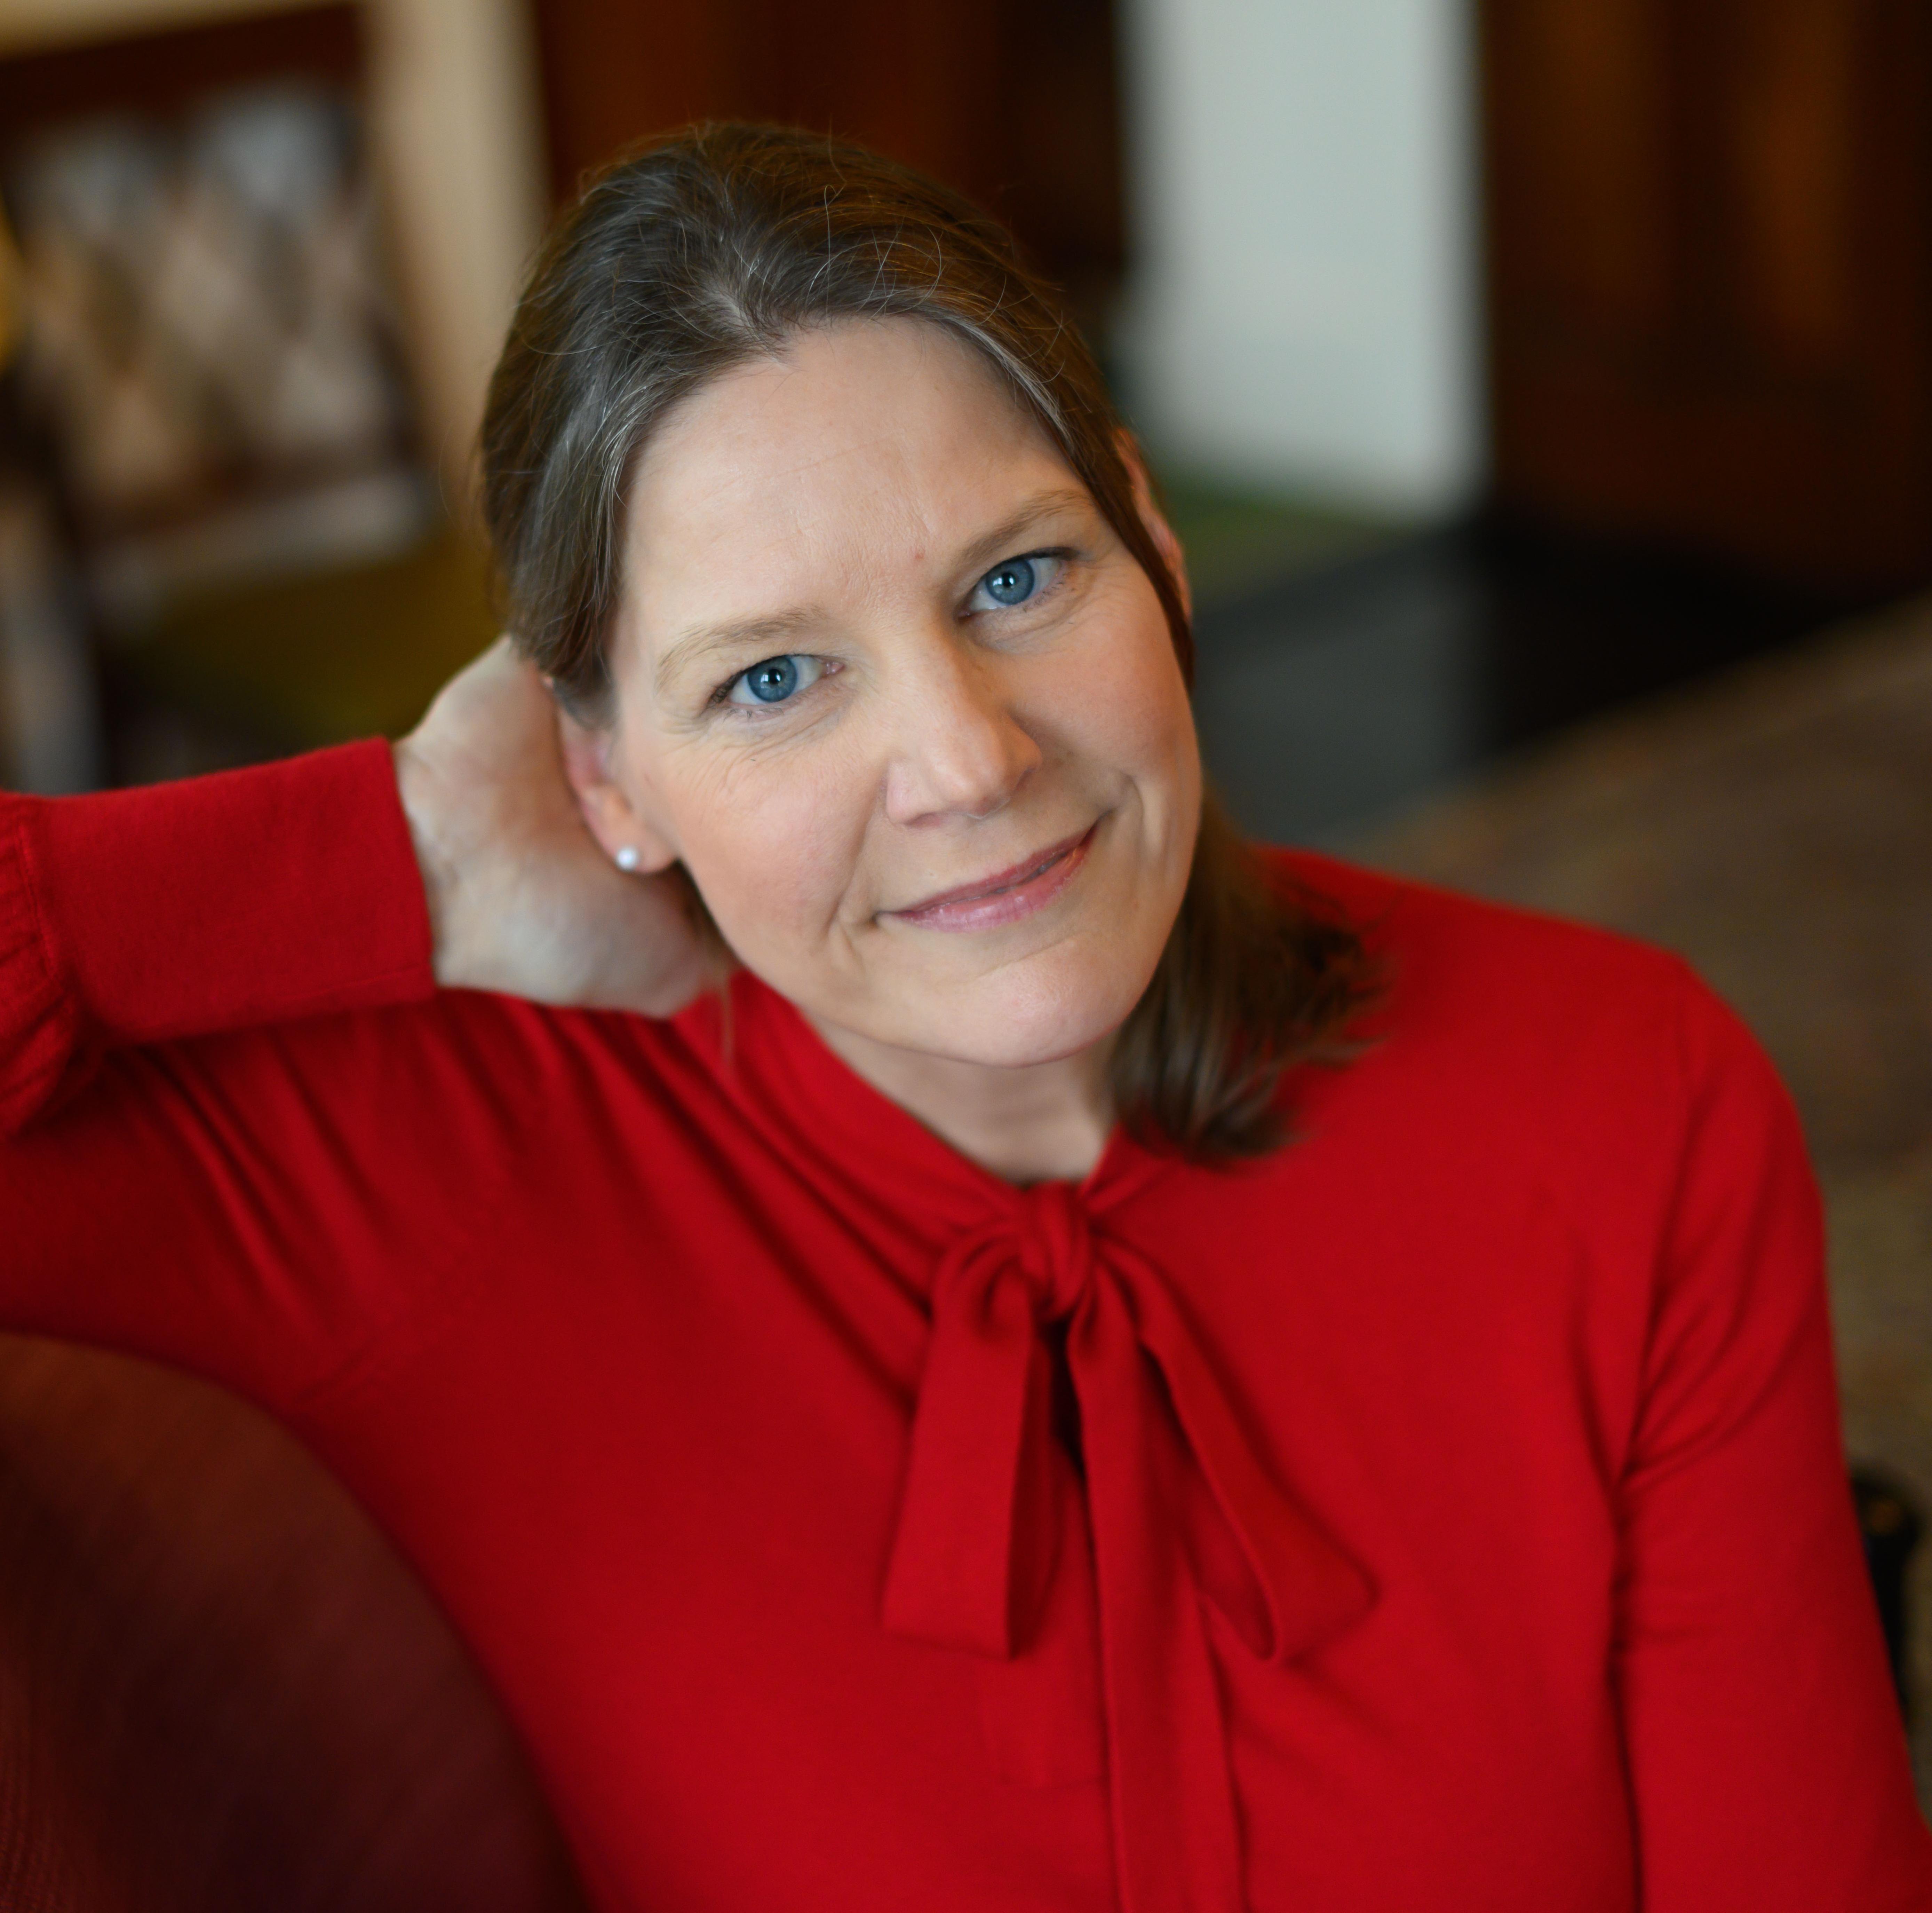 Photo Dr. med- Dunja Petersen